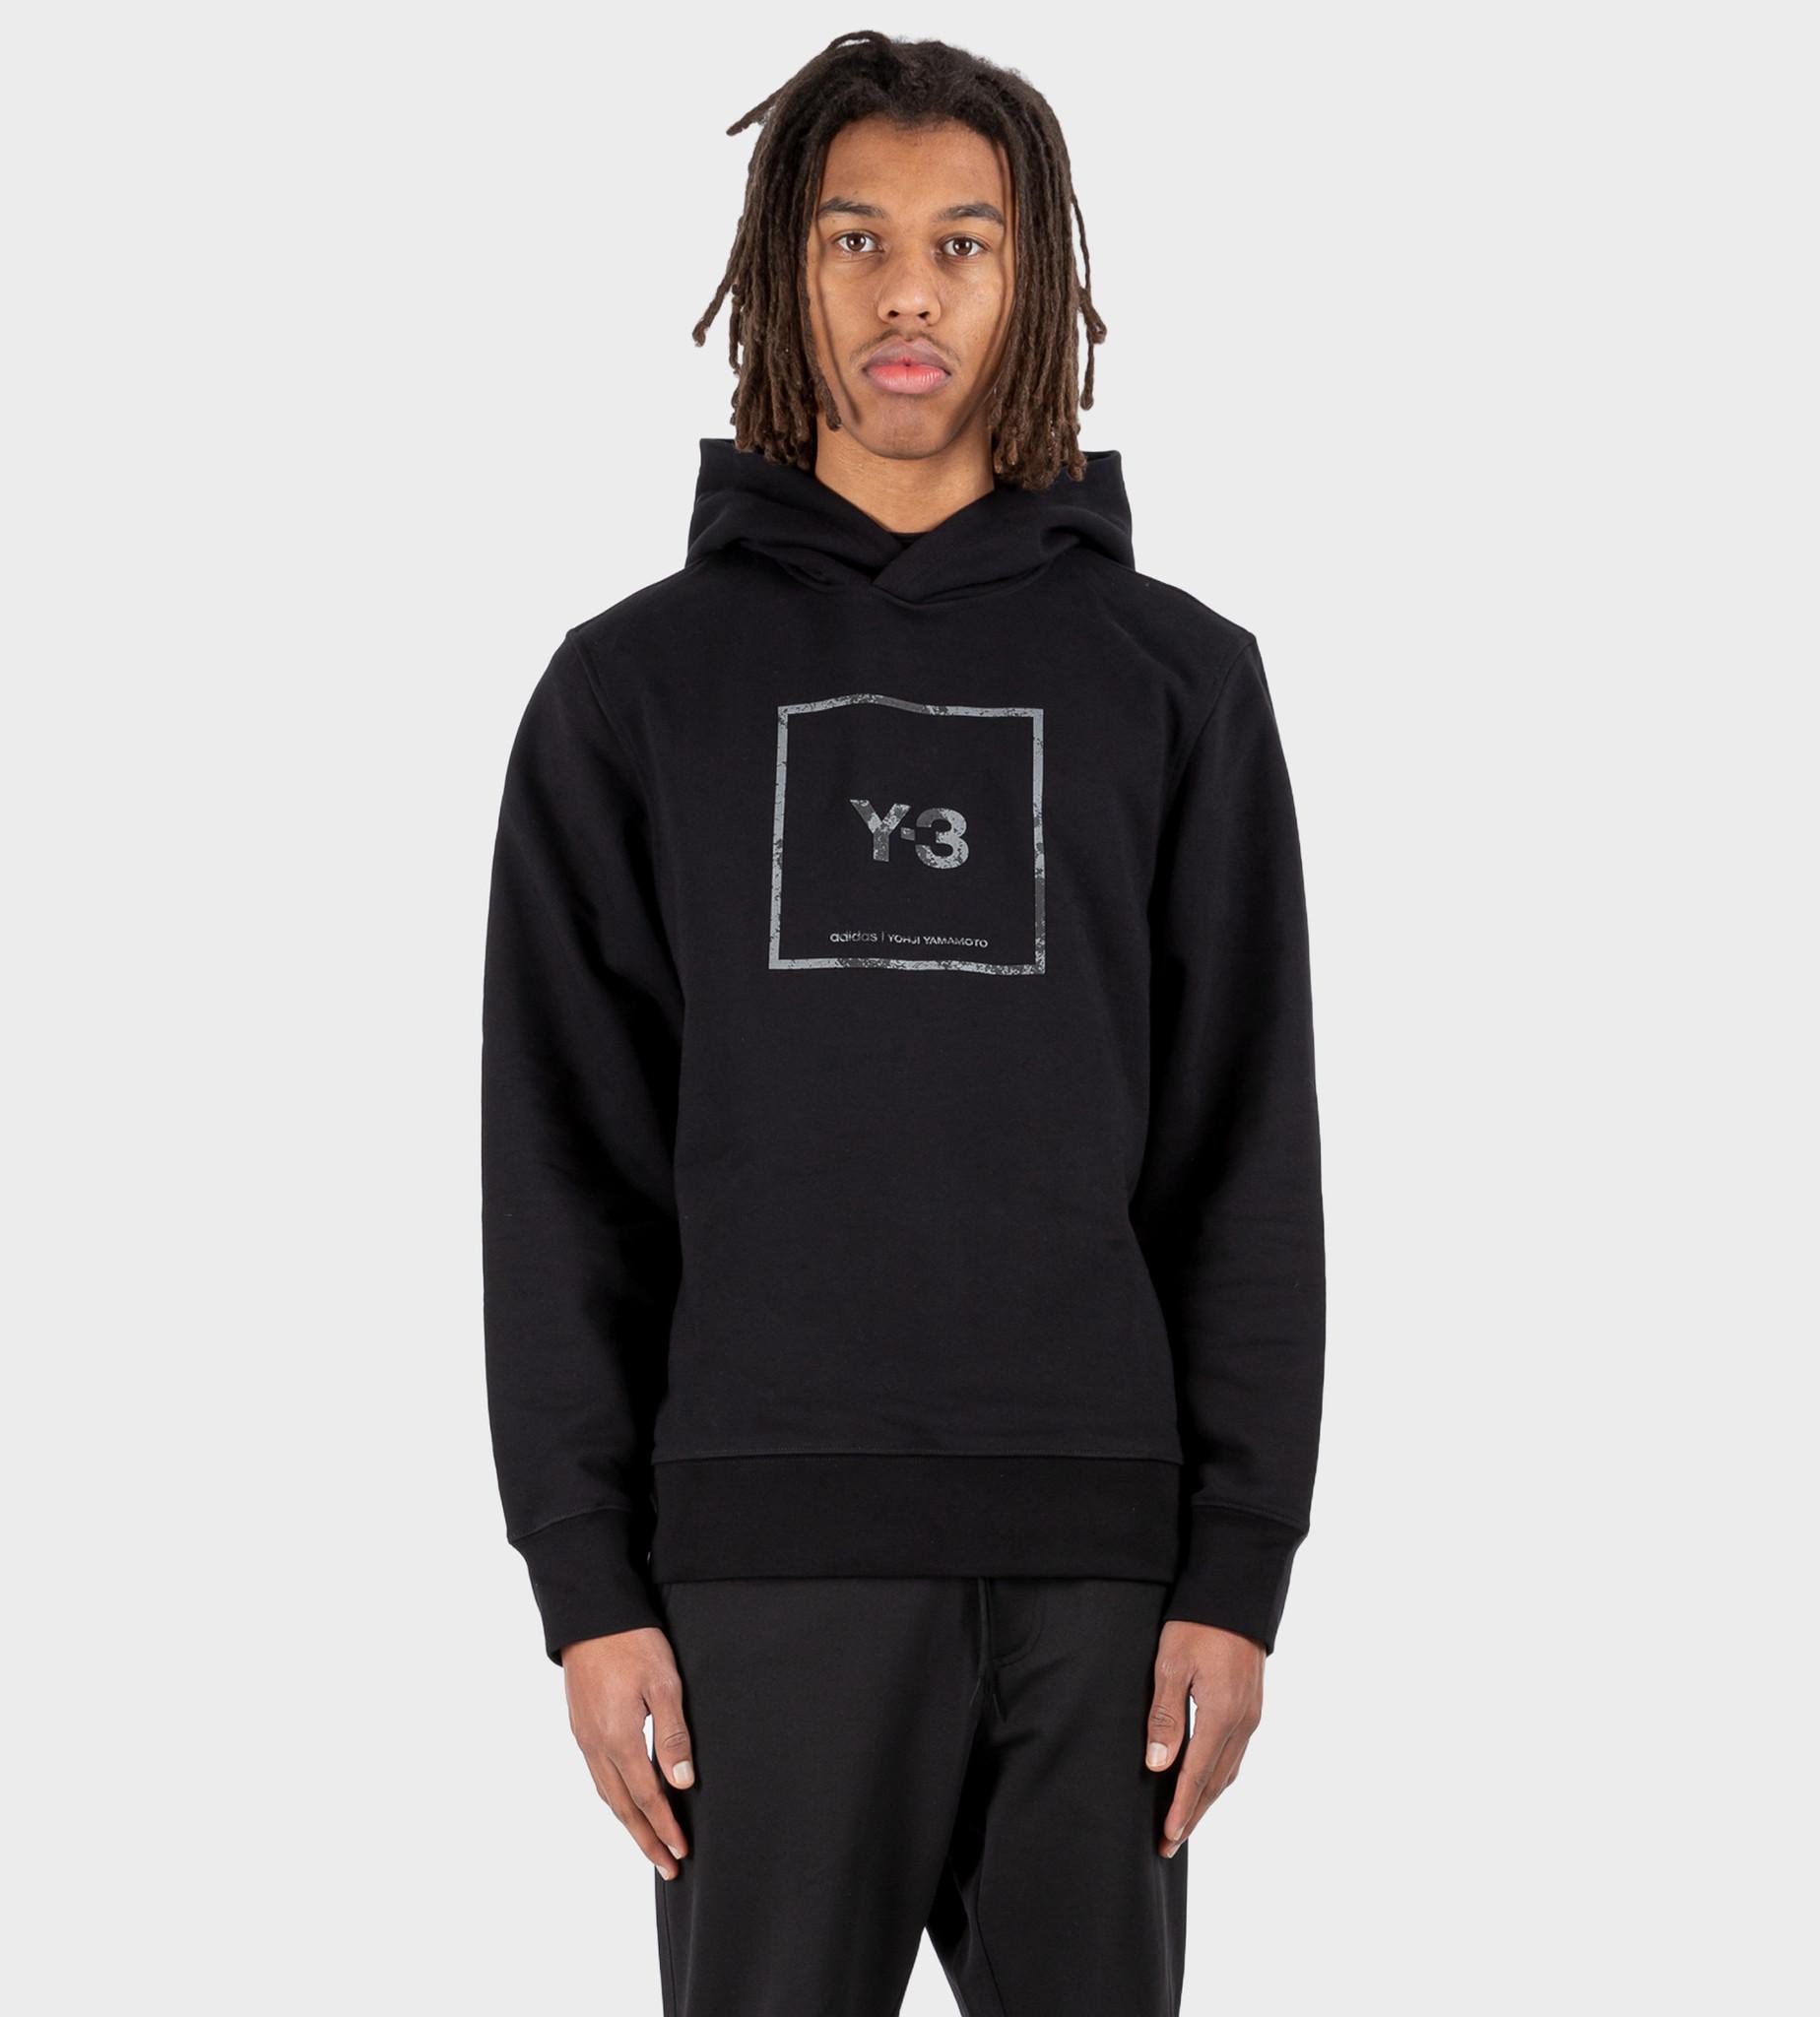 Y3 U Square Label Graphic Hoodie Black